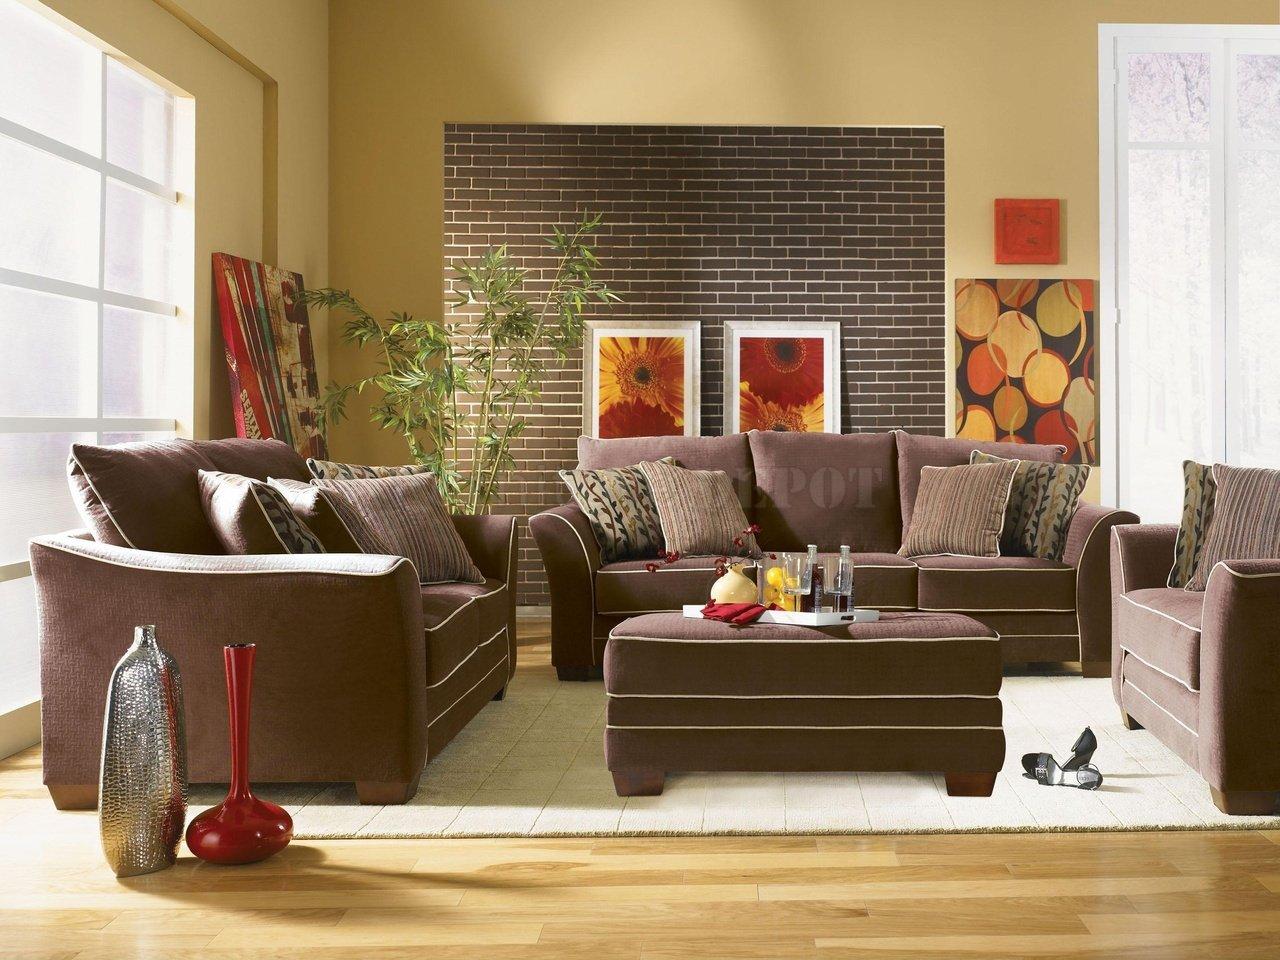 Living Room Furniture Ideas New Interior Design Ideas Interior Designs Home Design Ideas Living Room Furniture sofas Design